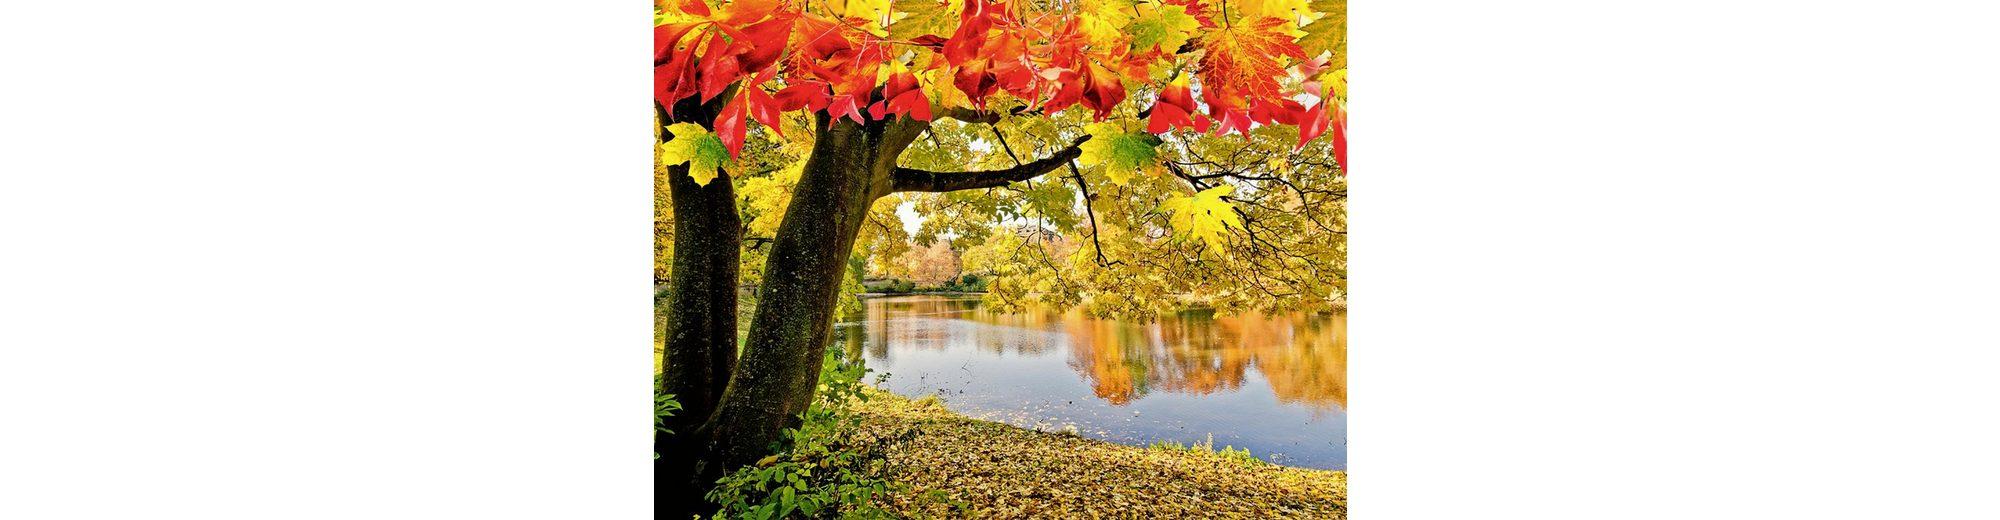 Home affaire Glasbild »D. Oberfrank-List: Wundervoller Herbsttag an einem ruhigen See«, 80/60 cm